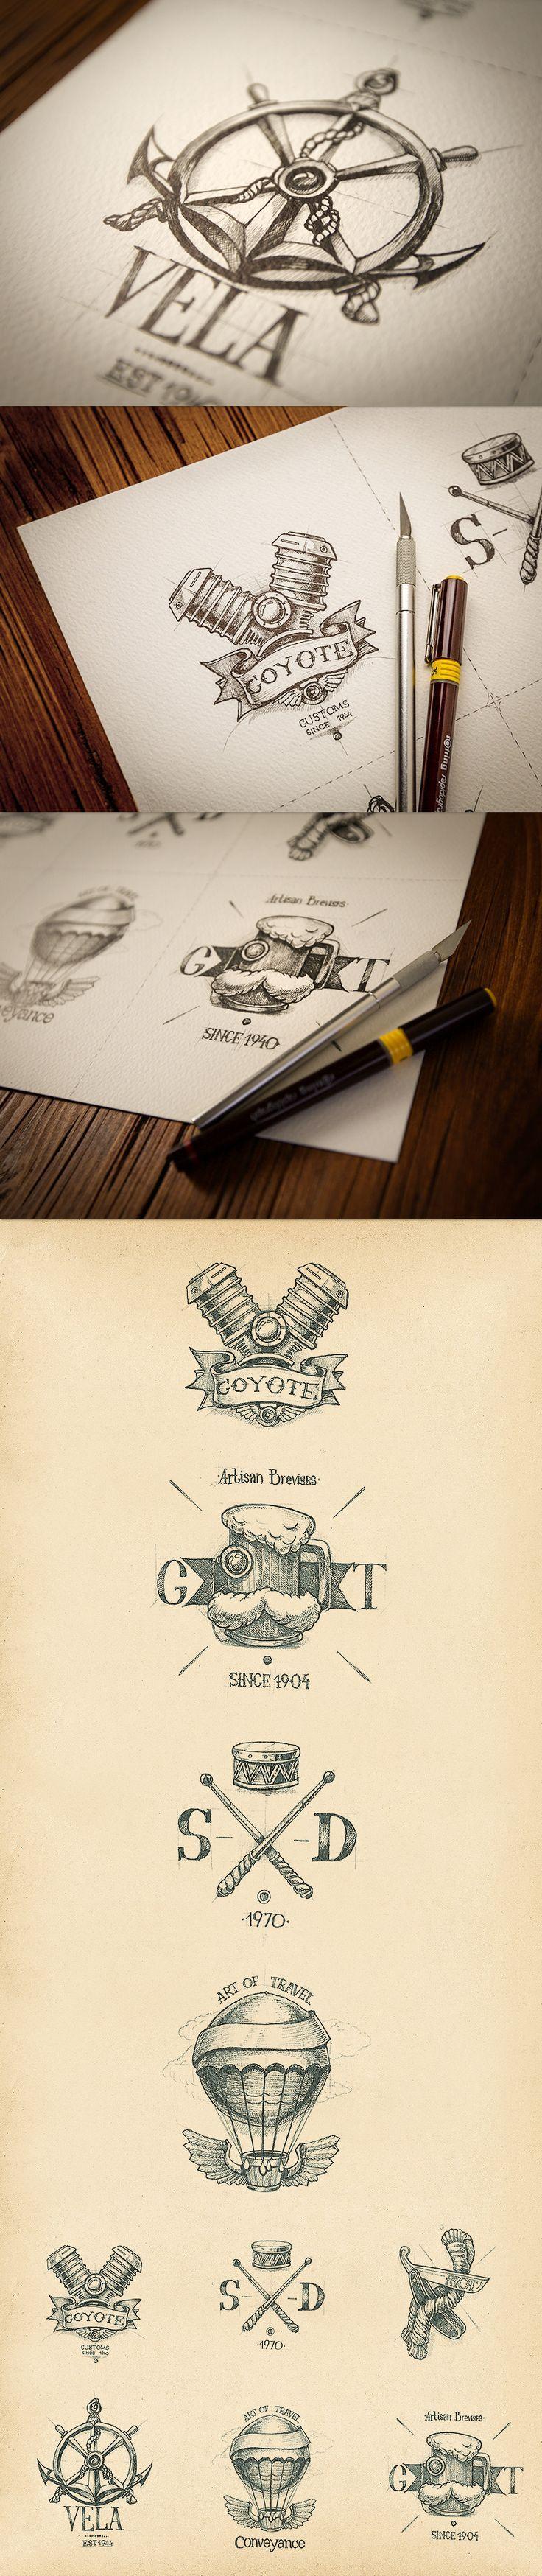 20 Inspiring Logo Sketches: